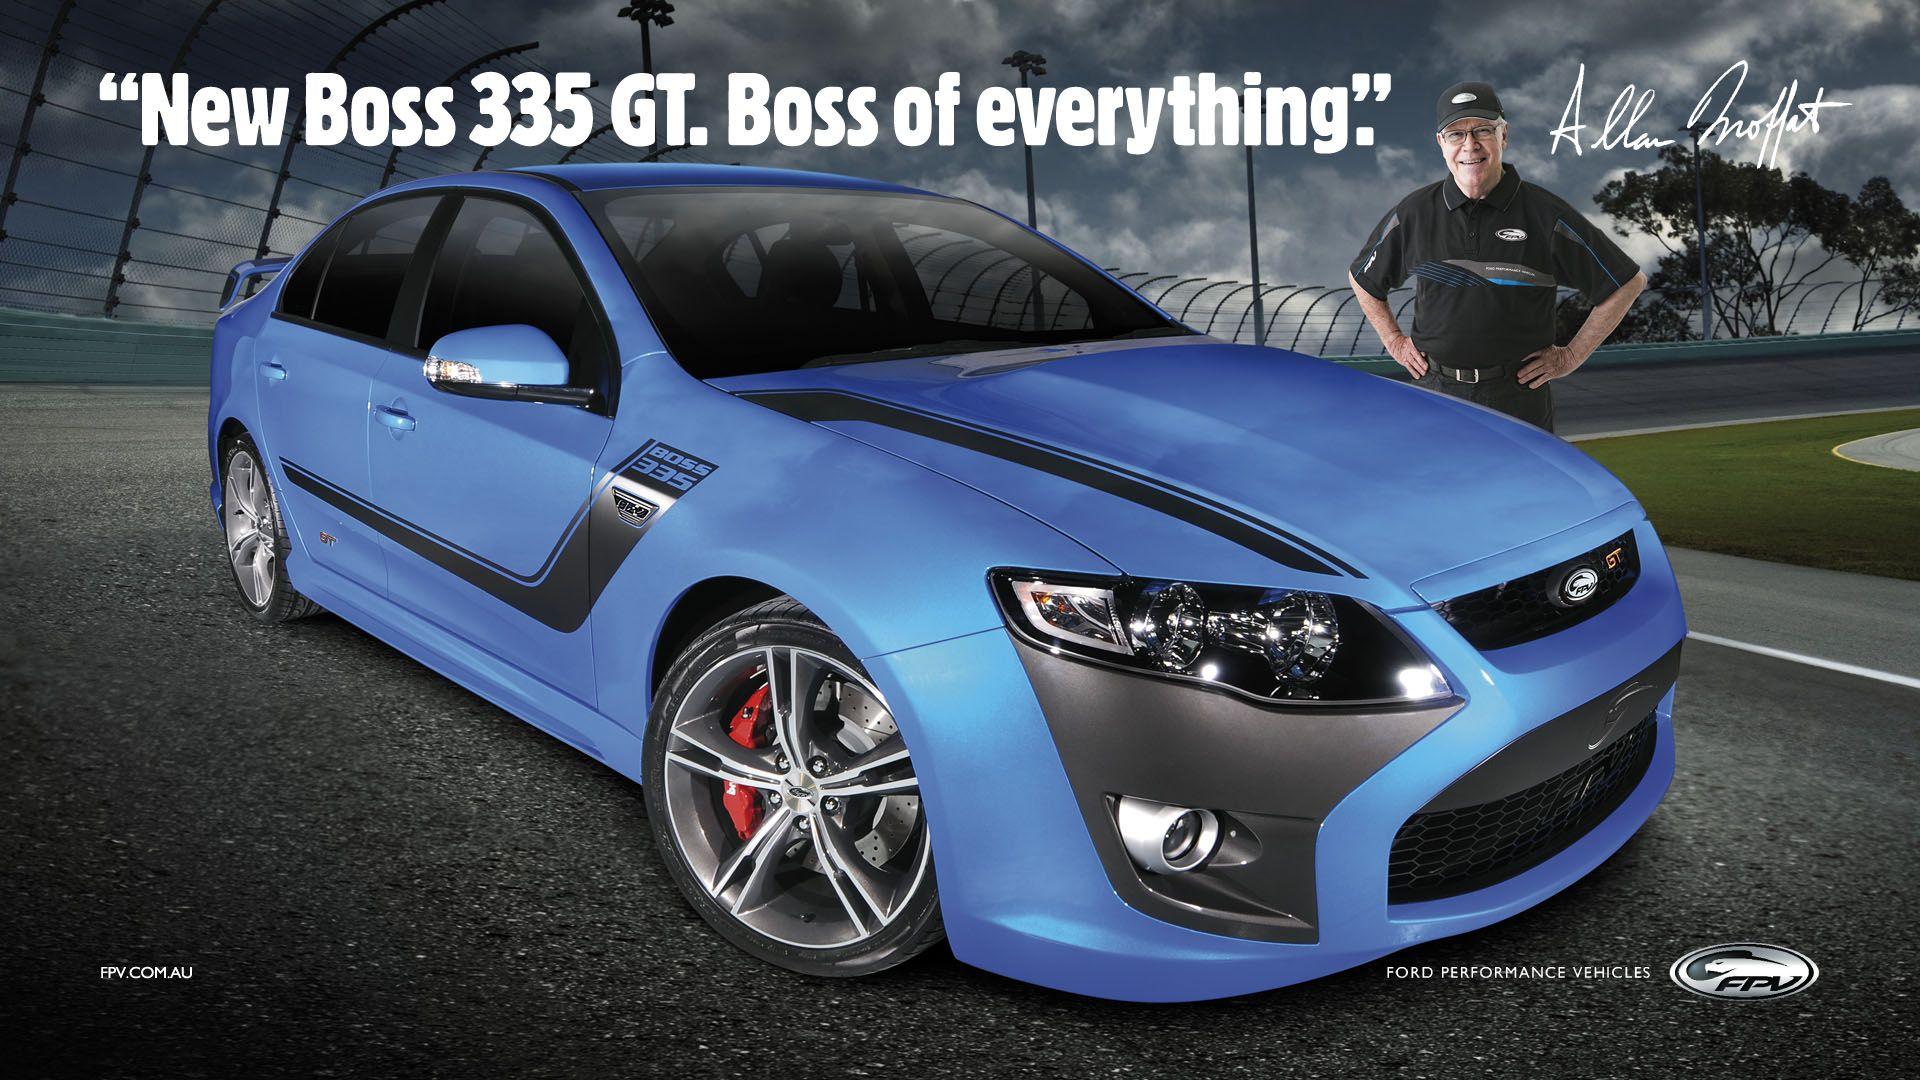 Fpv Gt Boss 335 Aussie Muscle Cars Hot Rods Cars Muscle Australian Cars